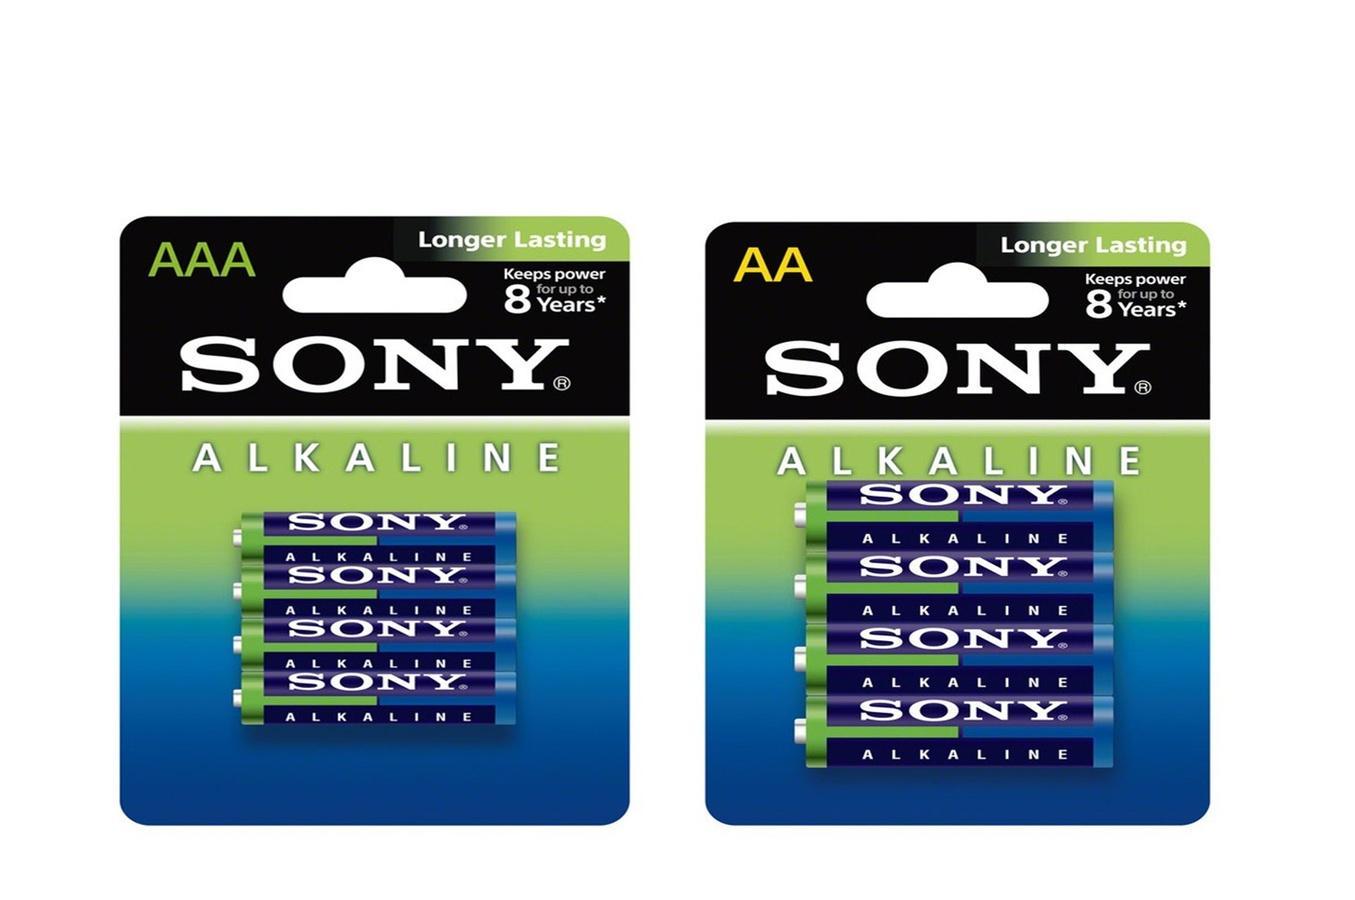 Pack de 60 piles Sony - 28 AAA LR03 et 32 AA LR06